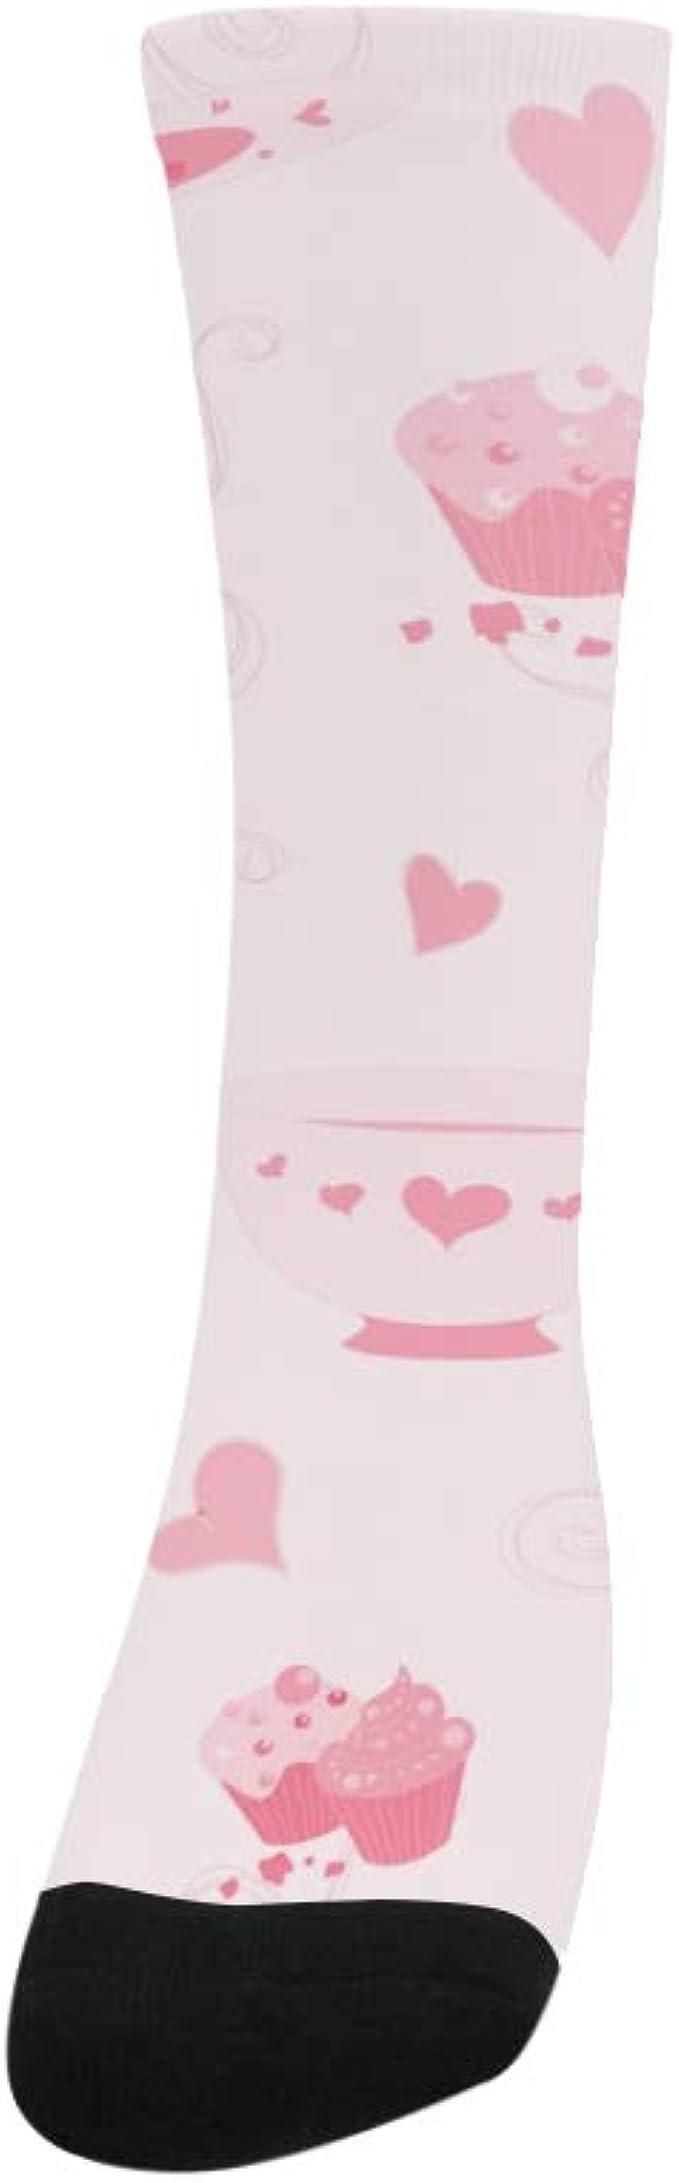 Cute Cups Drinks Painted Cartoon Crazy Soccer Dress Trouser Sock Women Botts